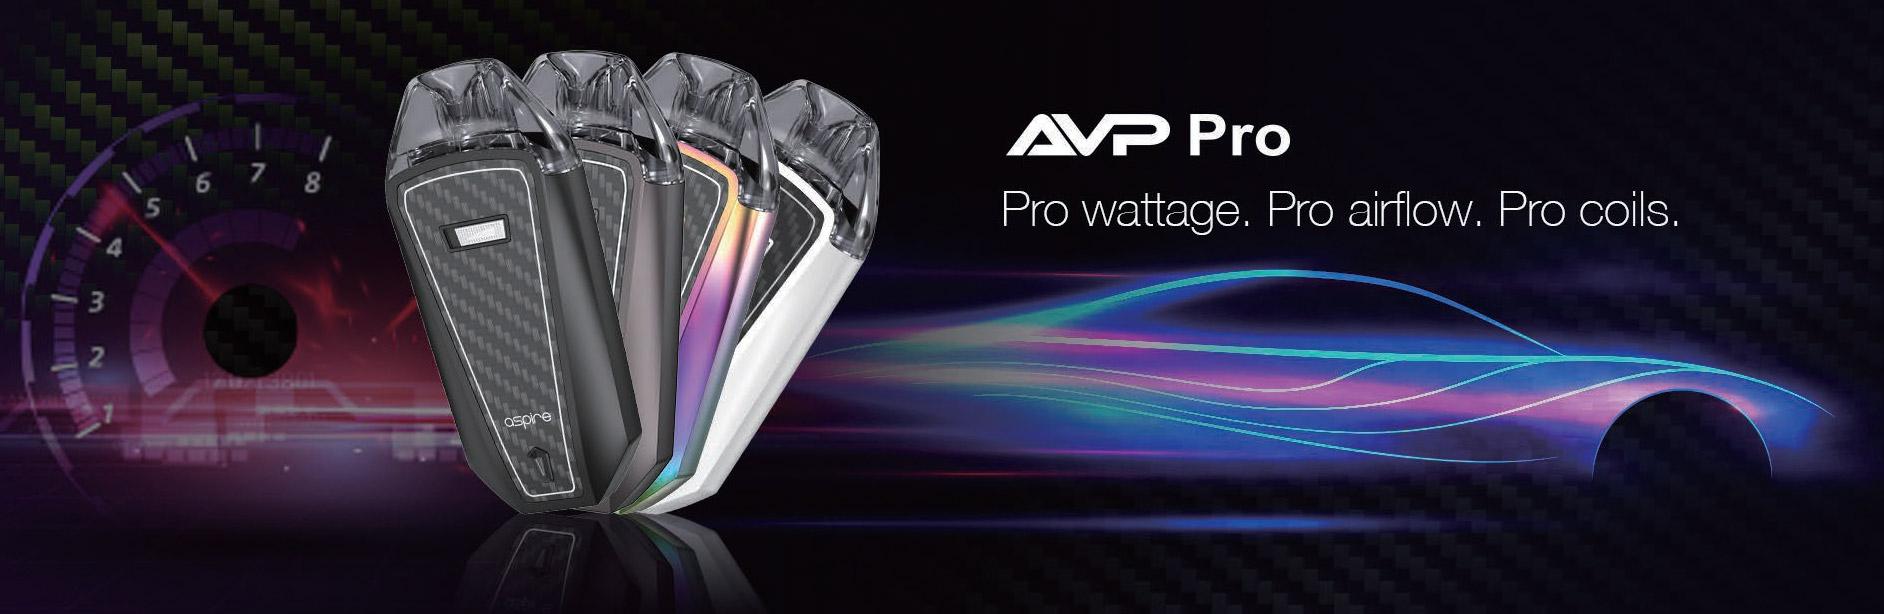 E-Zigaretten Set AVP Pro Aspire 1